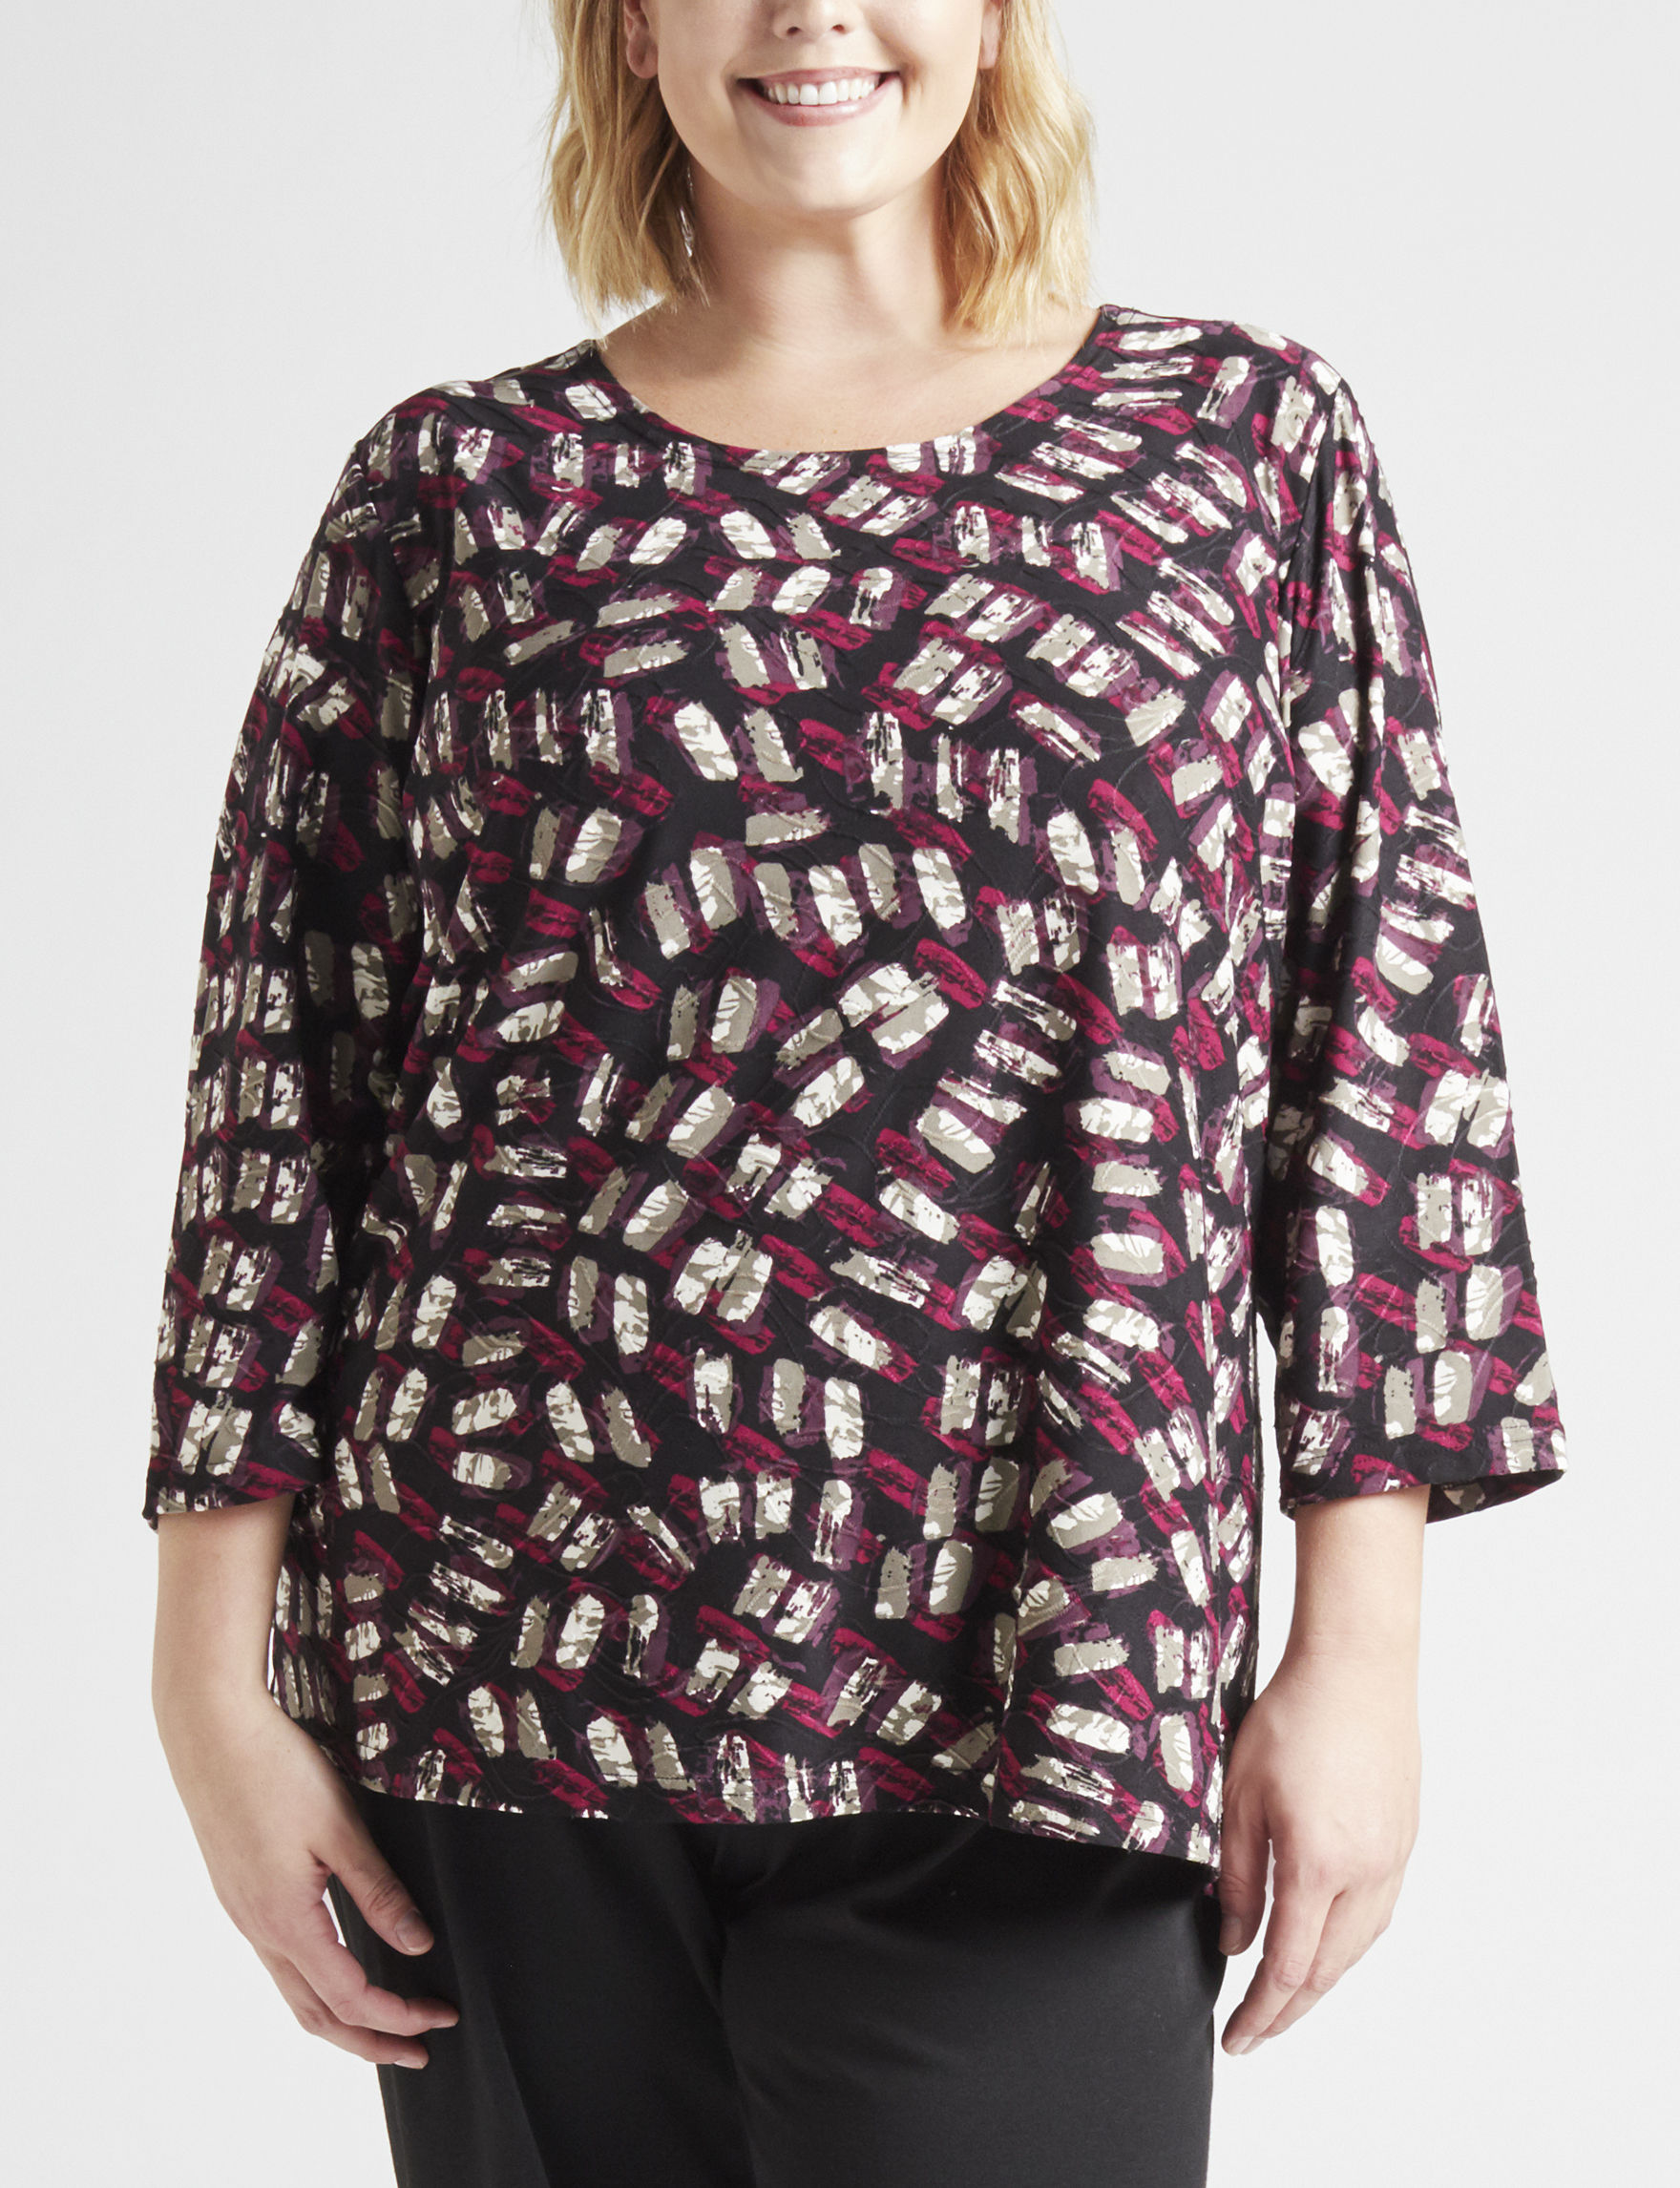 Rebecca Malone Black Multi Shirts & Blouses